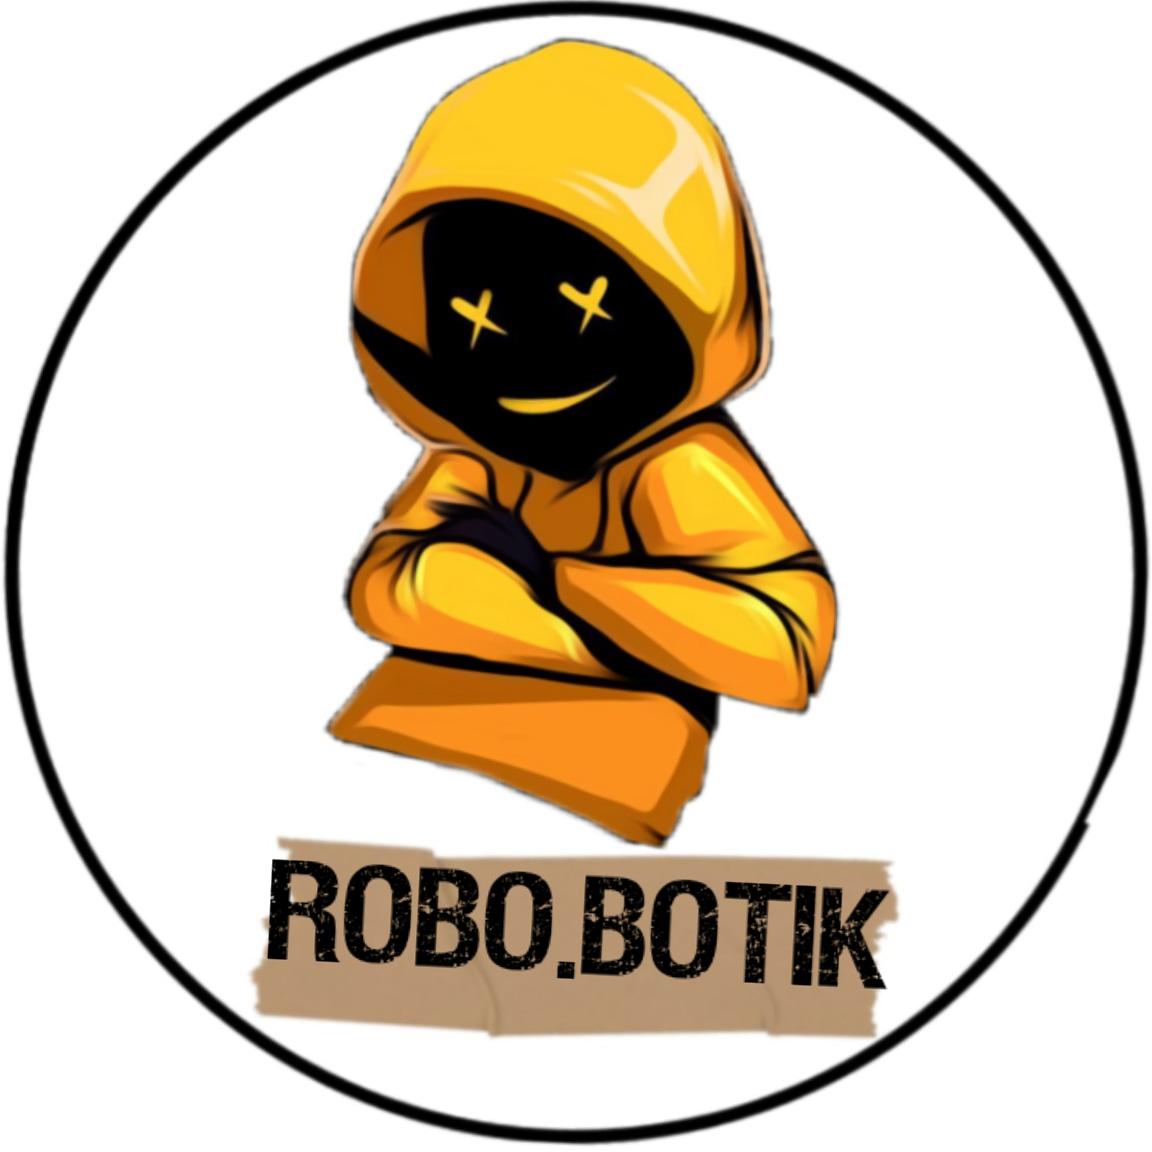 Robo.botik